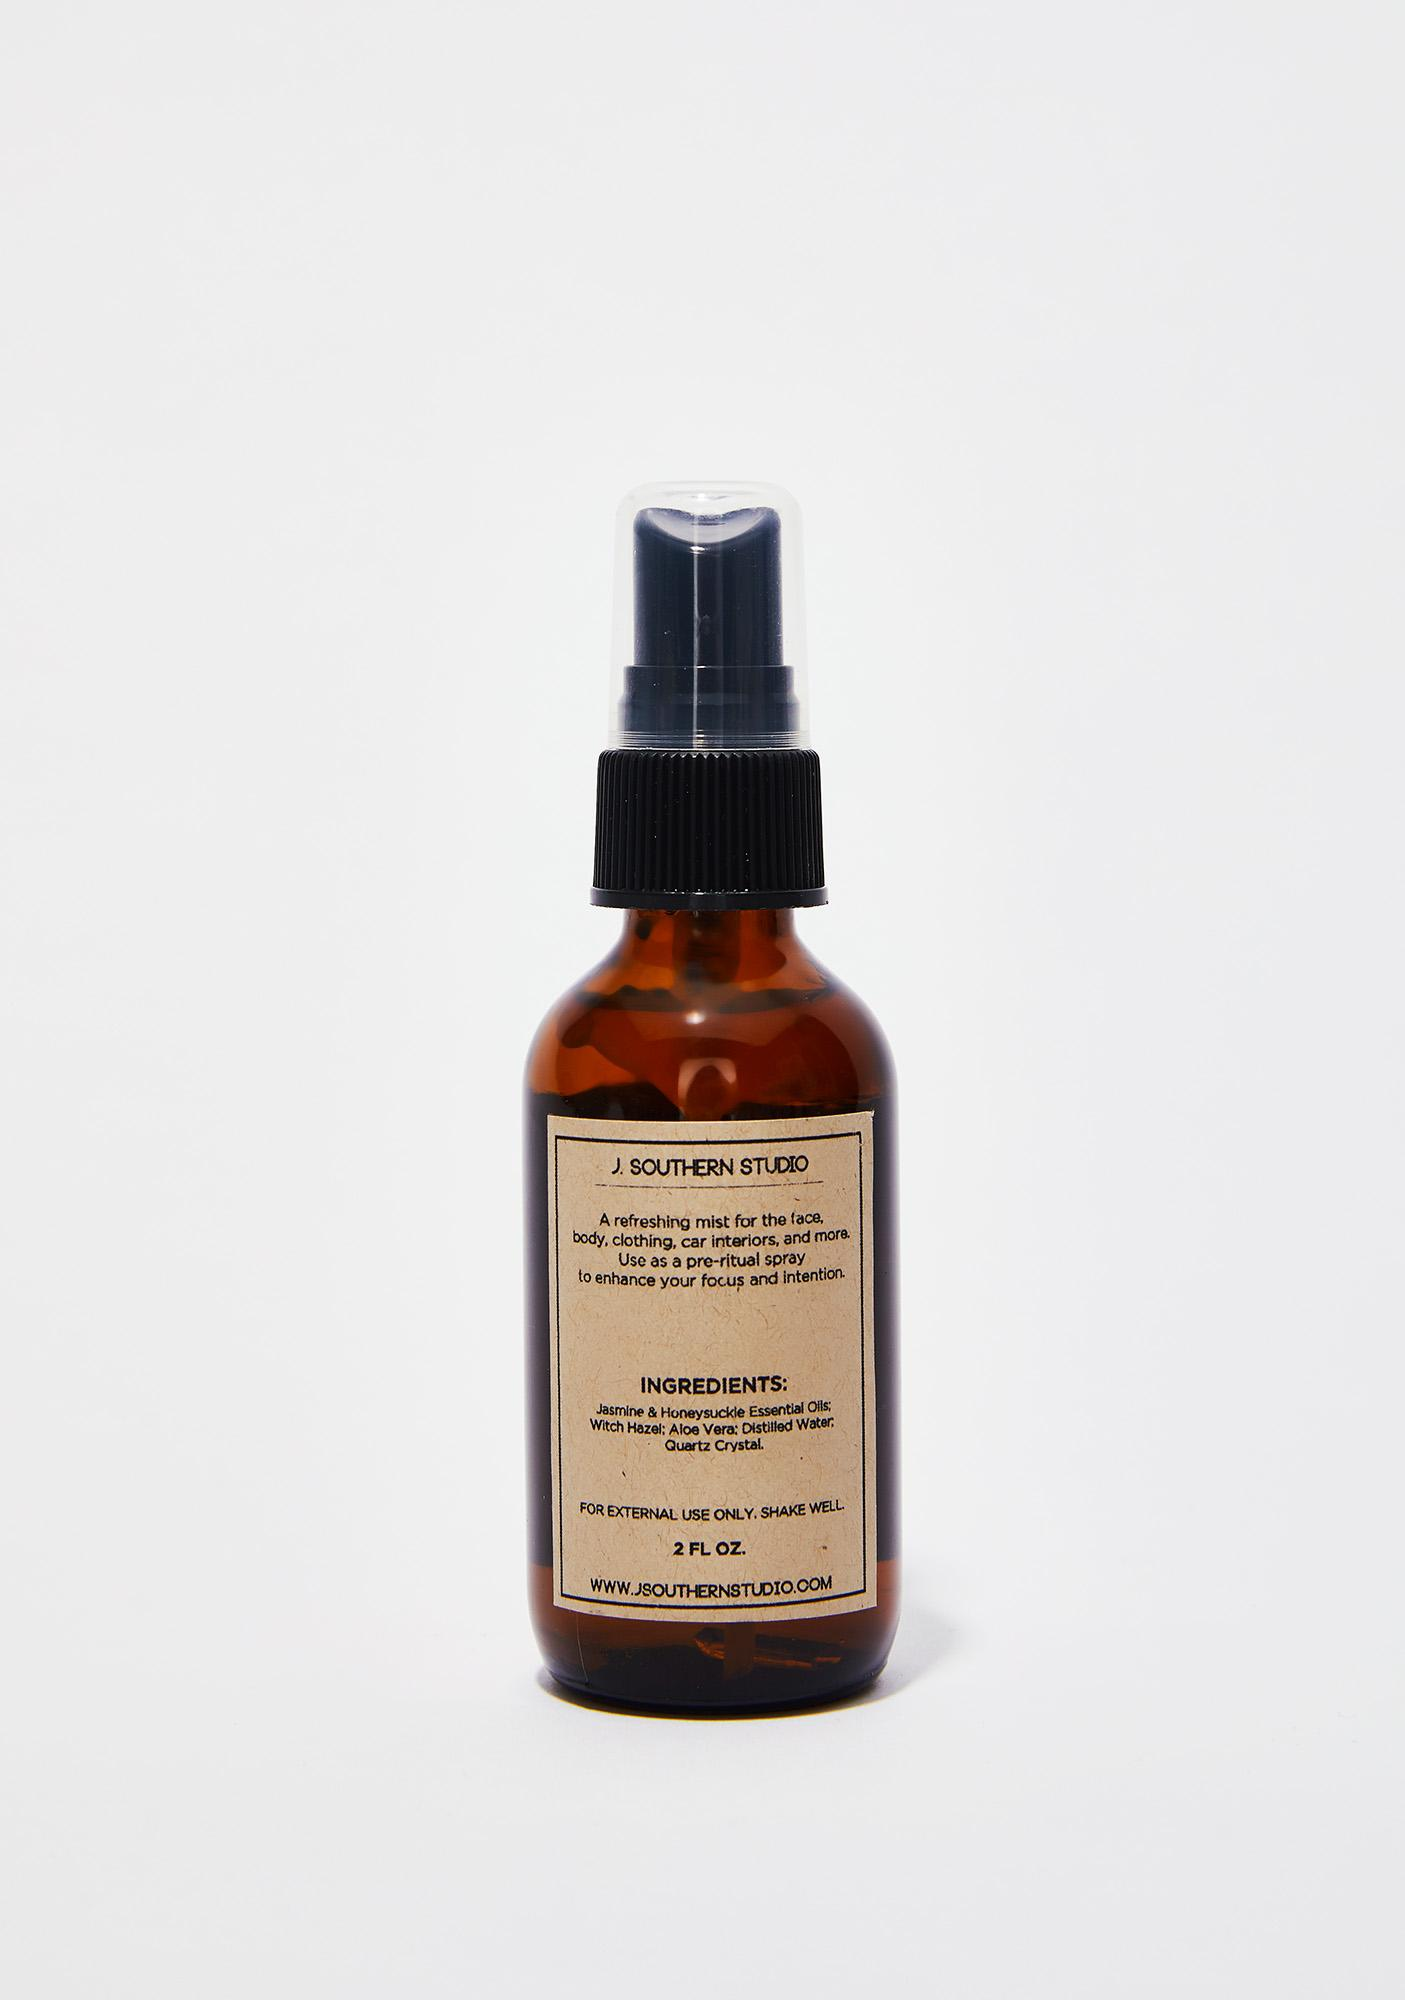 J. SOUTHERN STUDIO Honeysuckle & Jasmine Ritual Mist